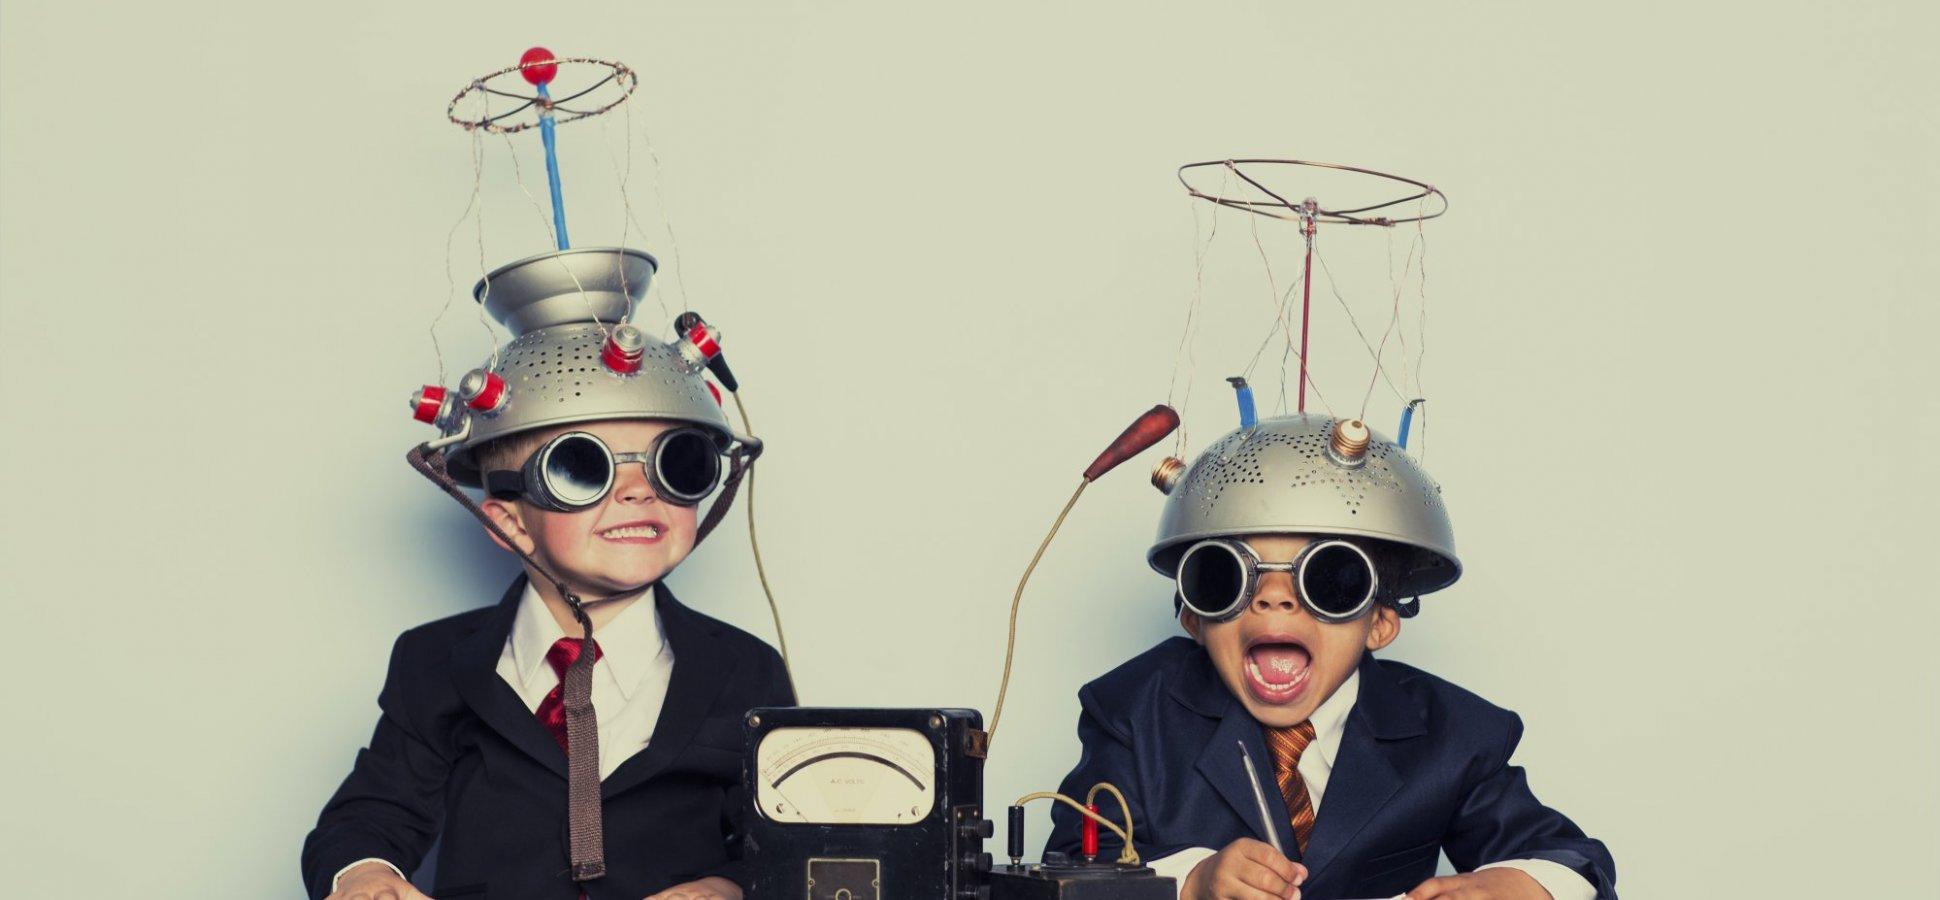 Tanpa Disadari, 10 Ciri Ini Menandakan Sebenarnya Kamu Kreatif Banget